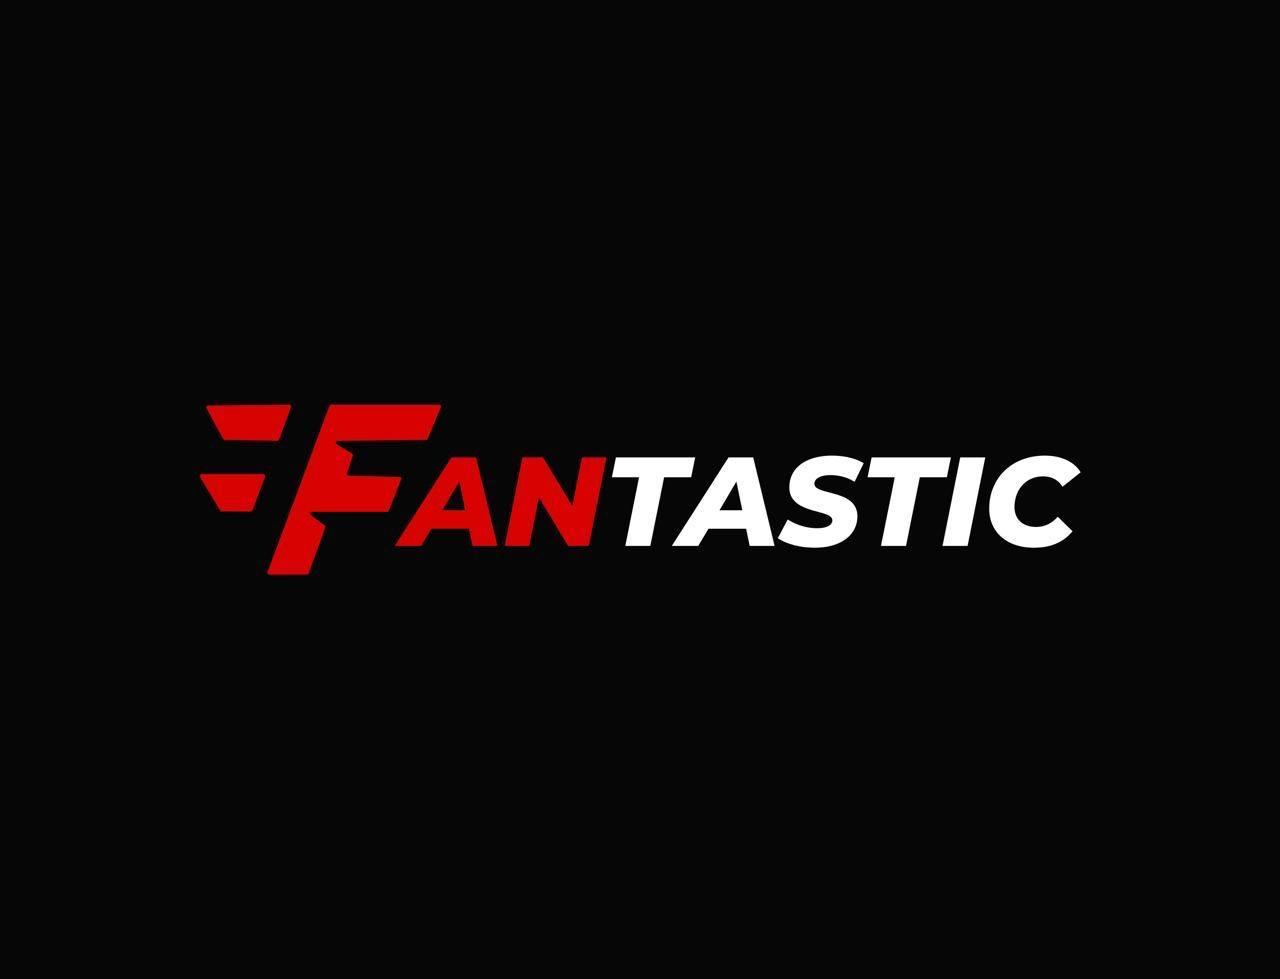 Nigerian Gaming Firm Fanstatic